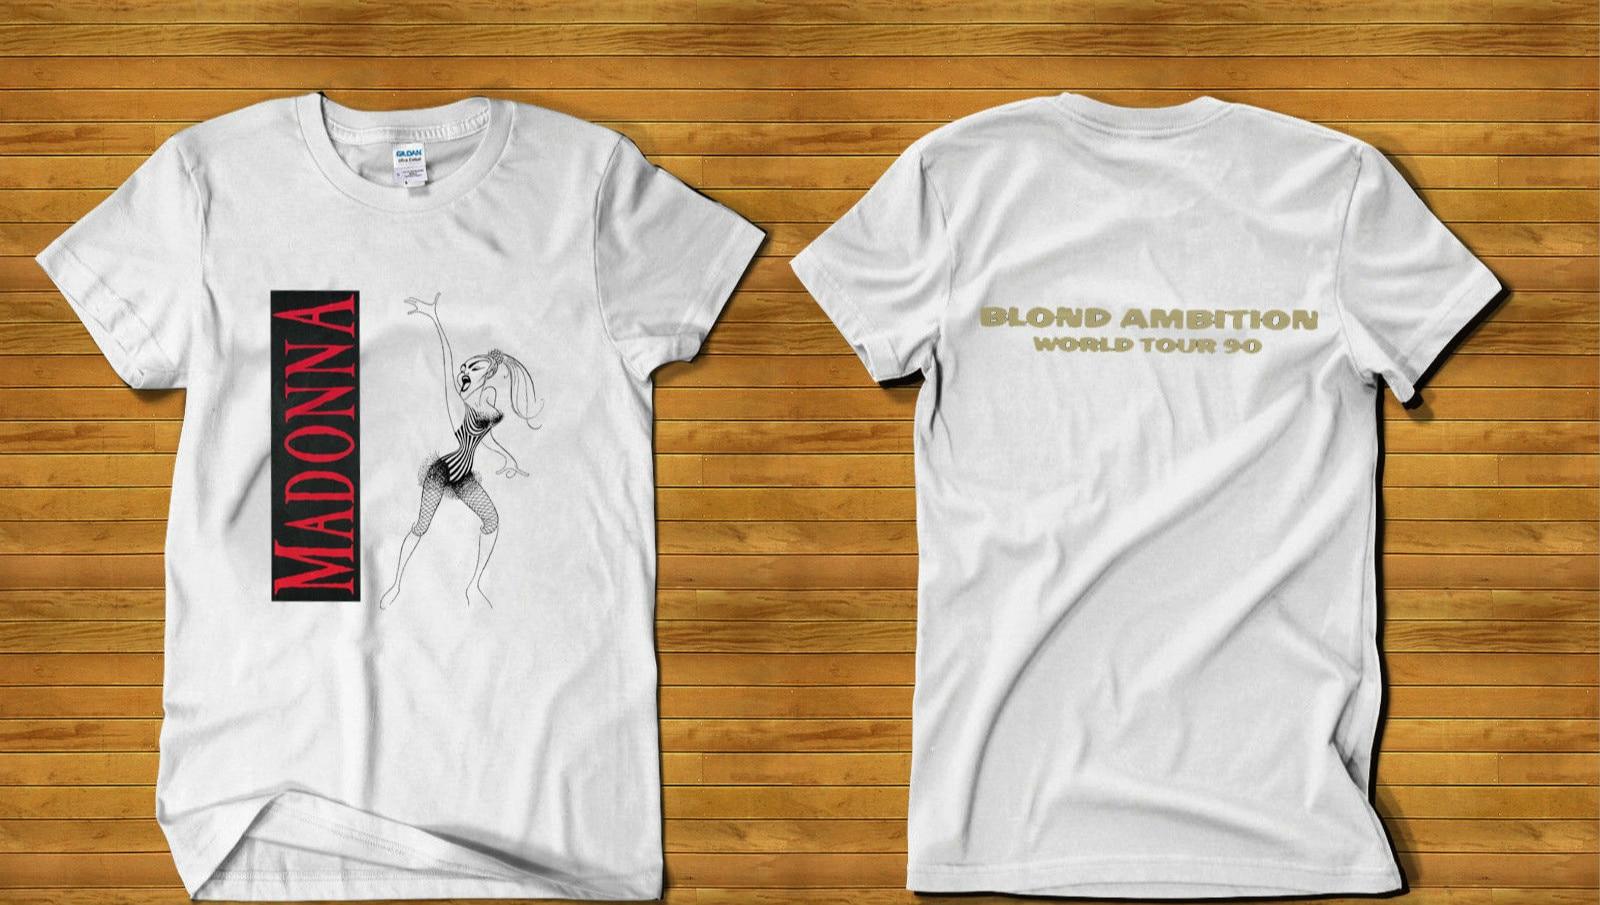 fba7adda52a Madonna Blond Ambition World Tour concert Gilda T shirt Sz S